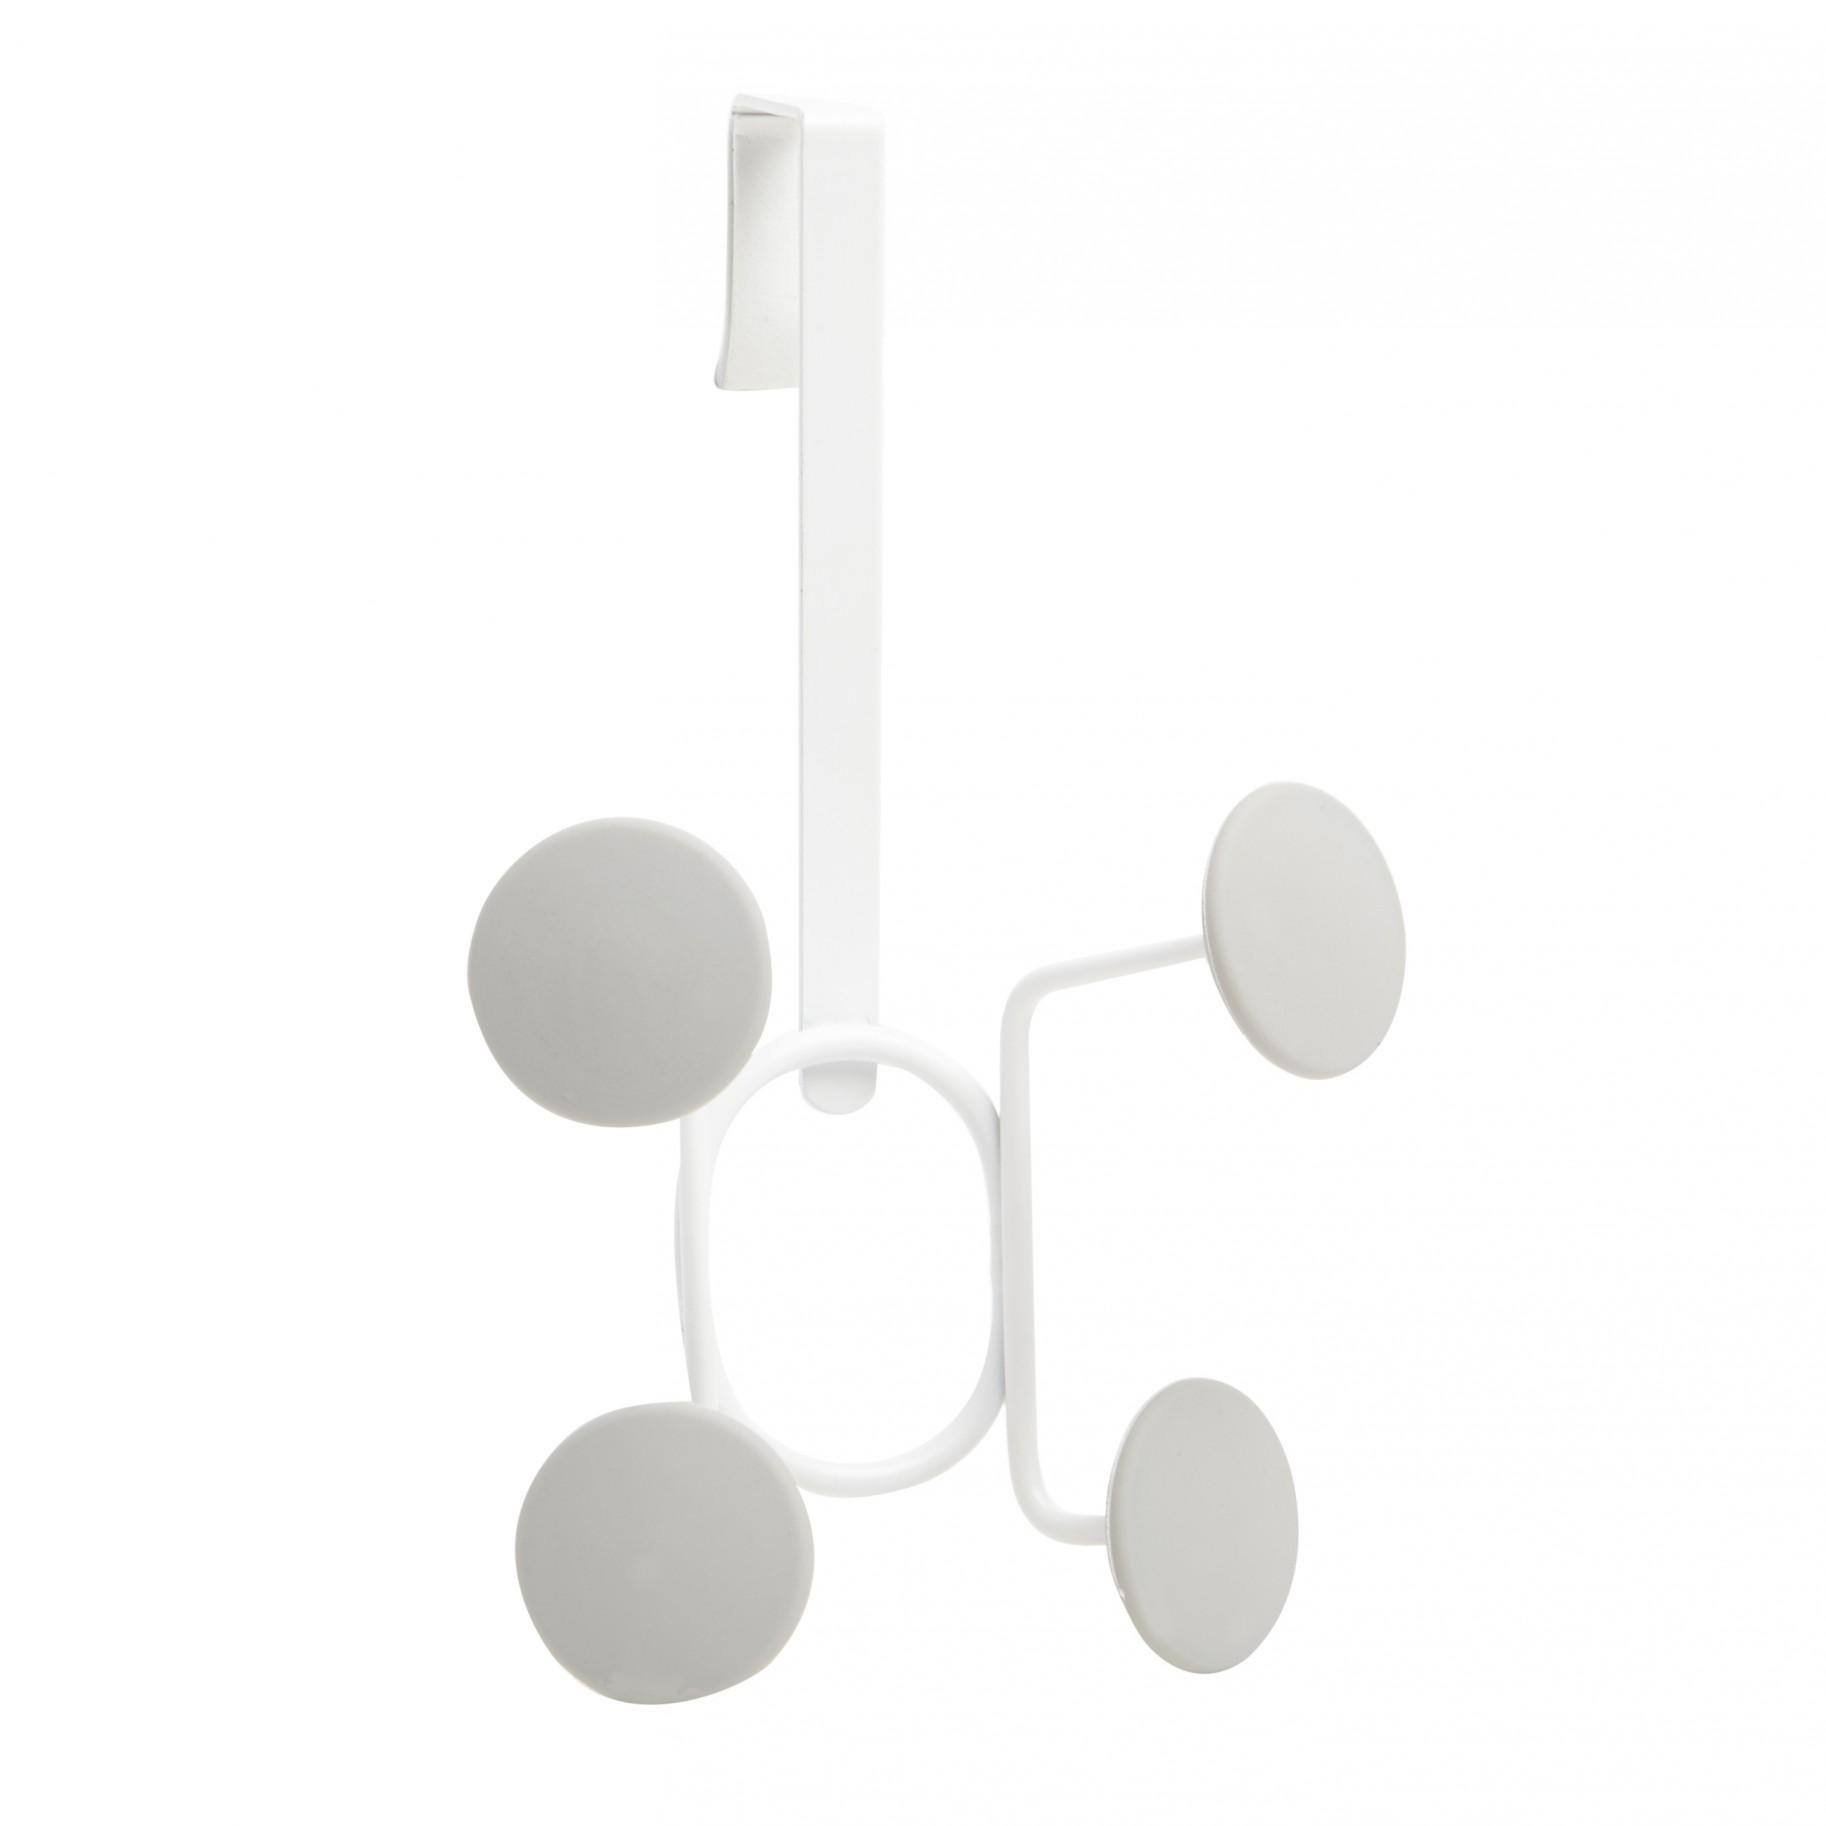 Porte-manteaux-design-Yook-Umbra-012